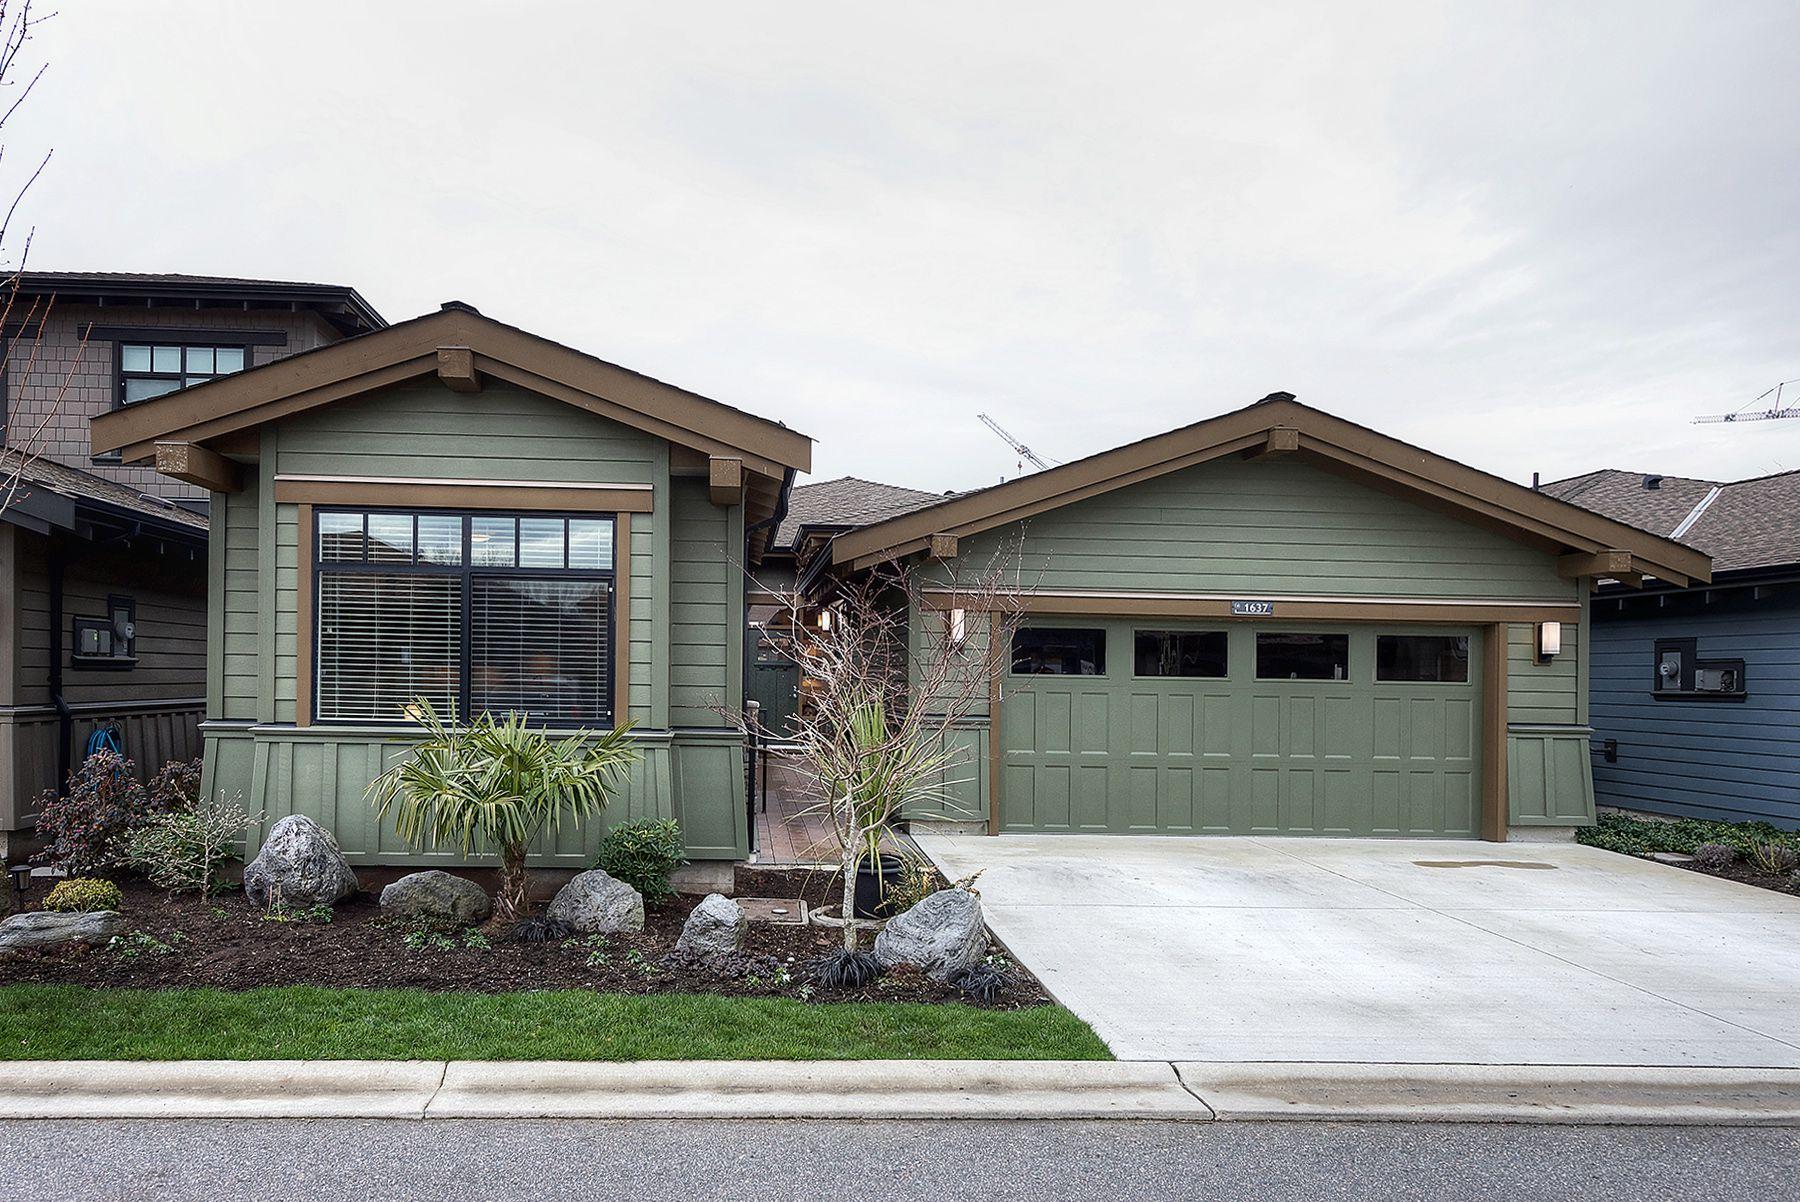 "Main Photo: 1637 FIR SPRINGS Lane in Delta: Cliff Drive House for sale in ""TSAWWASSEN SPRINGS"" (Tsawwassen)  : MLS®# R2247377"